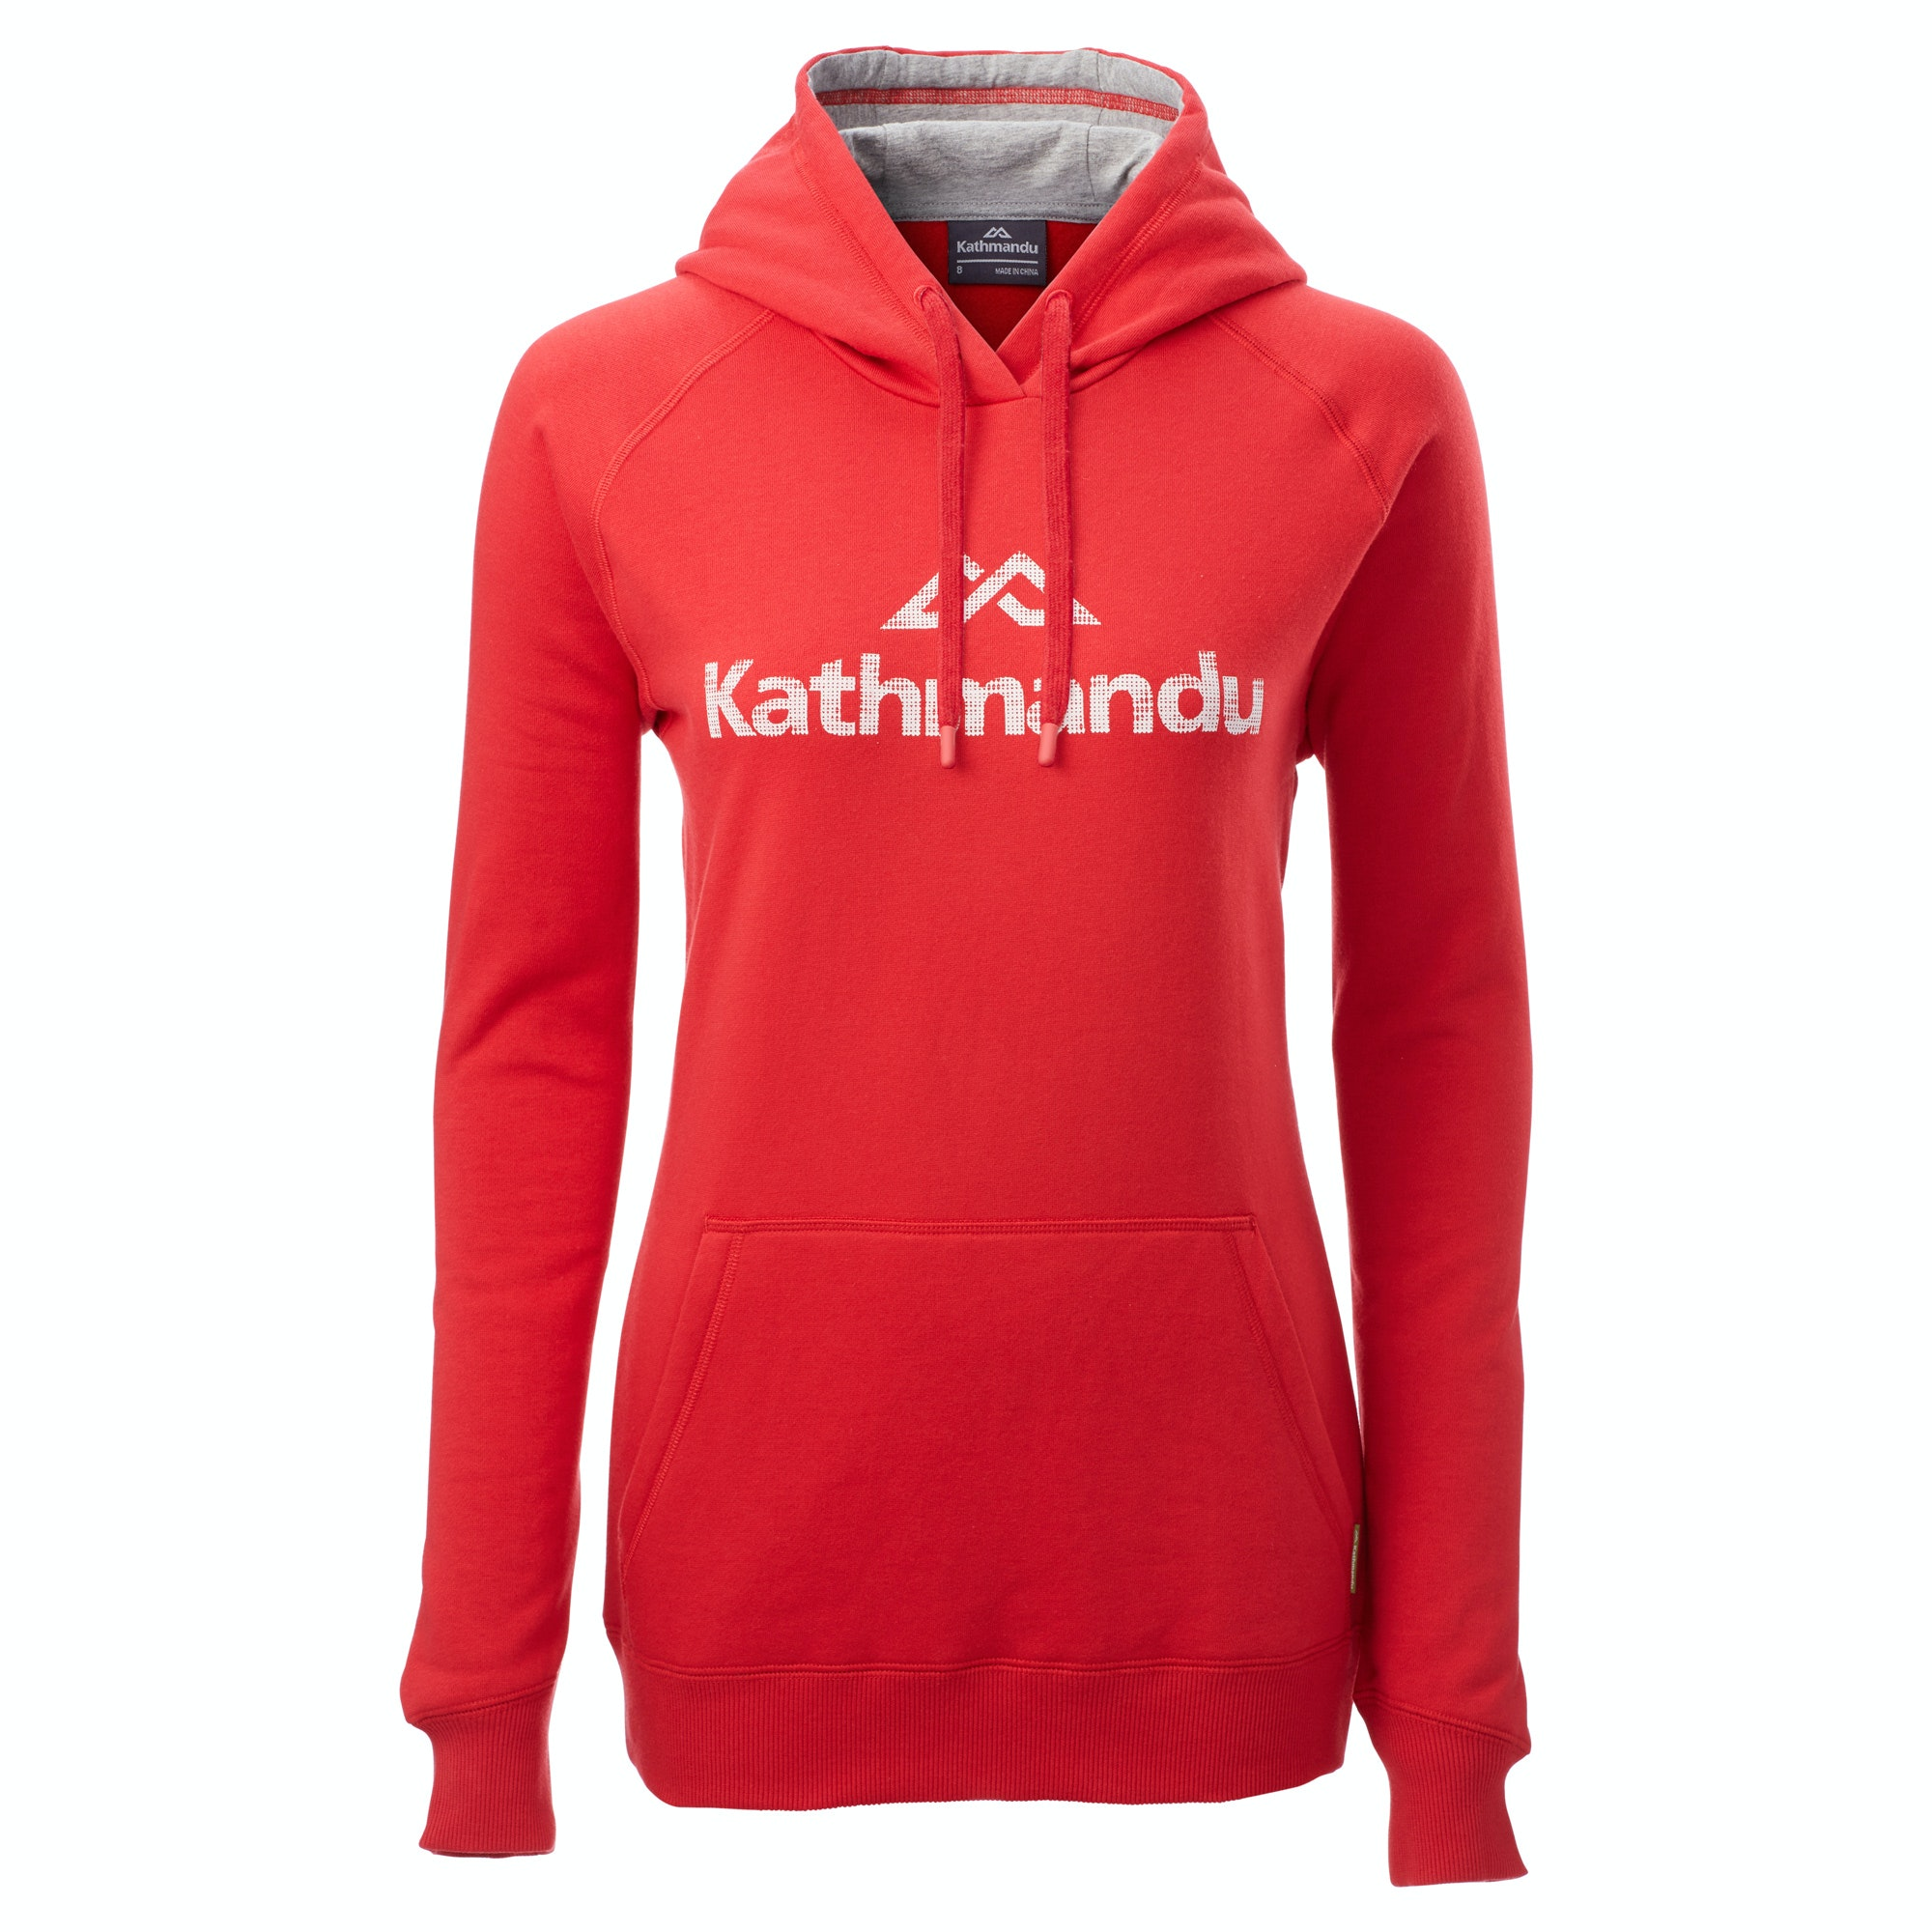 kathmandu women 39 s hooded pullover bear grylls uk. Black Bedroom Furniture Sets. Home Design Ideas